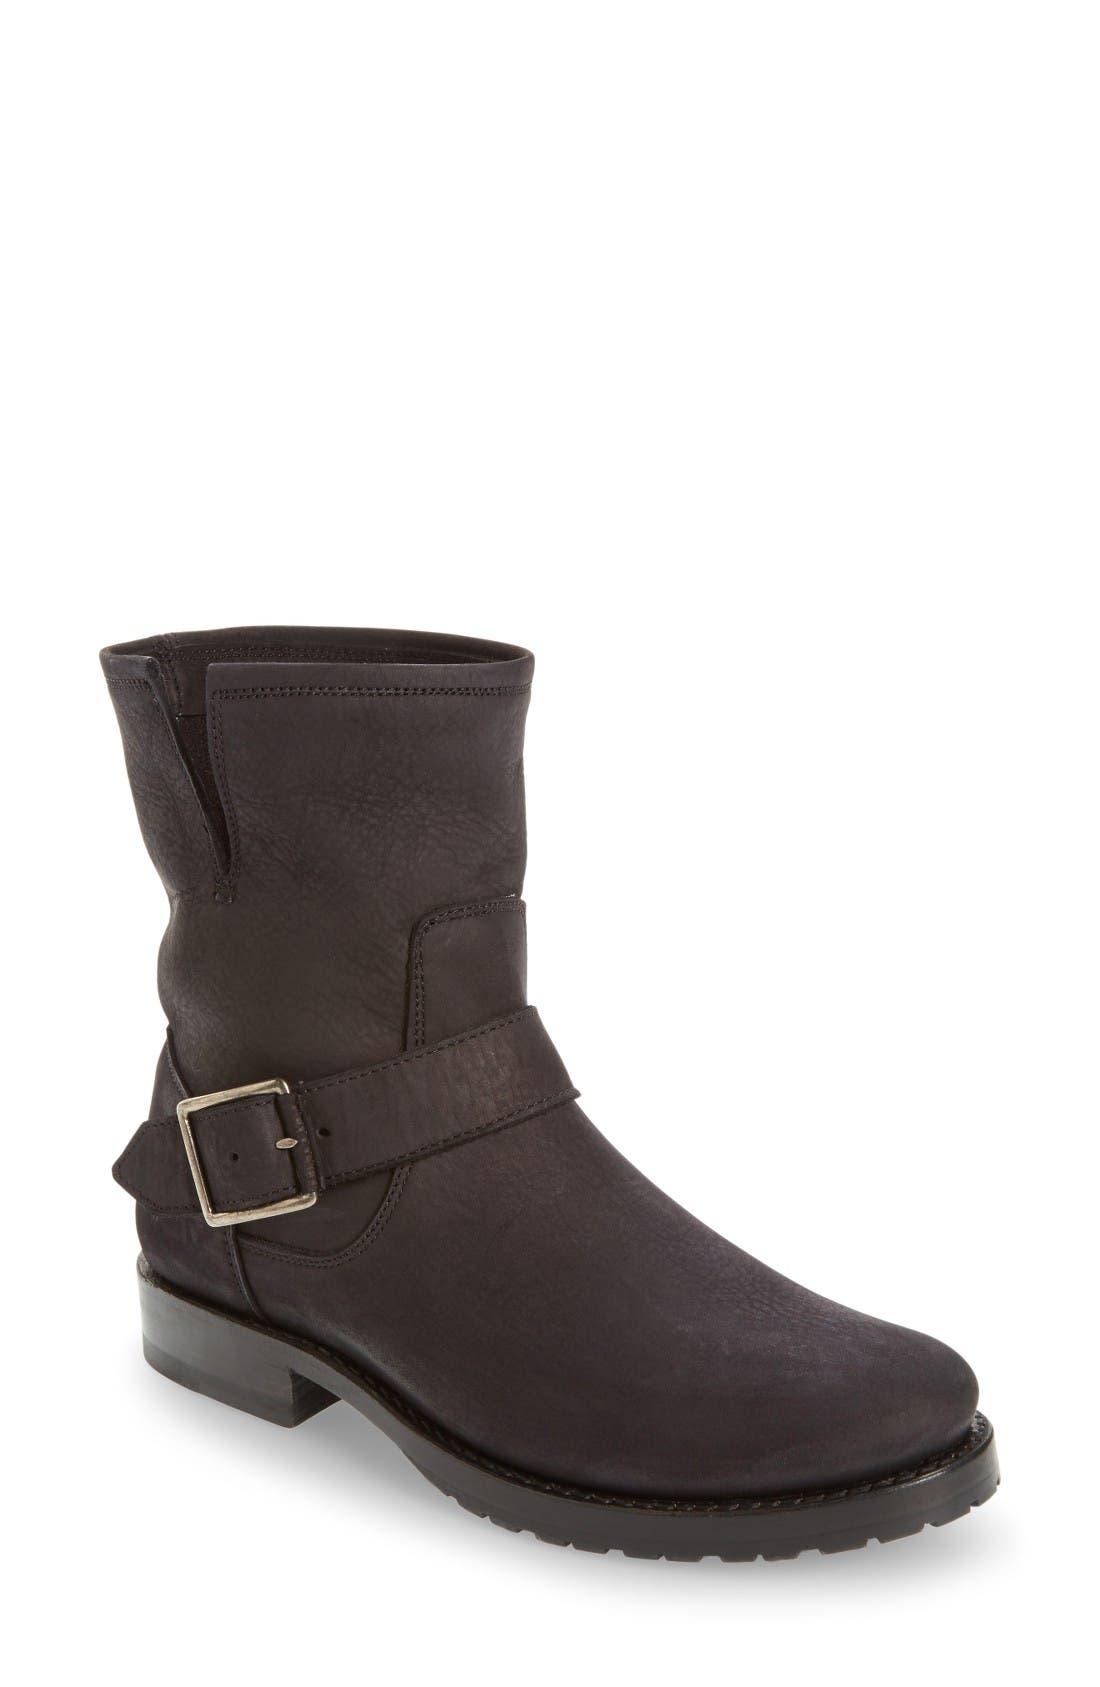 'Natalie' Engineer Boot,                             Main thumbnail 1, color,                             Black/ Black